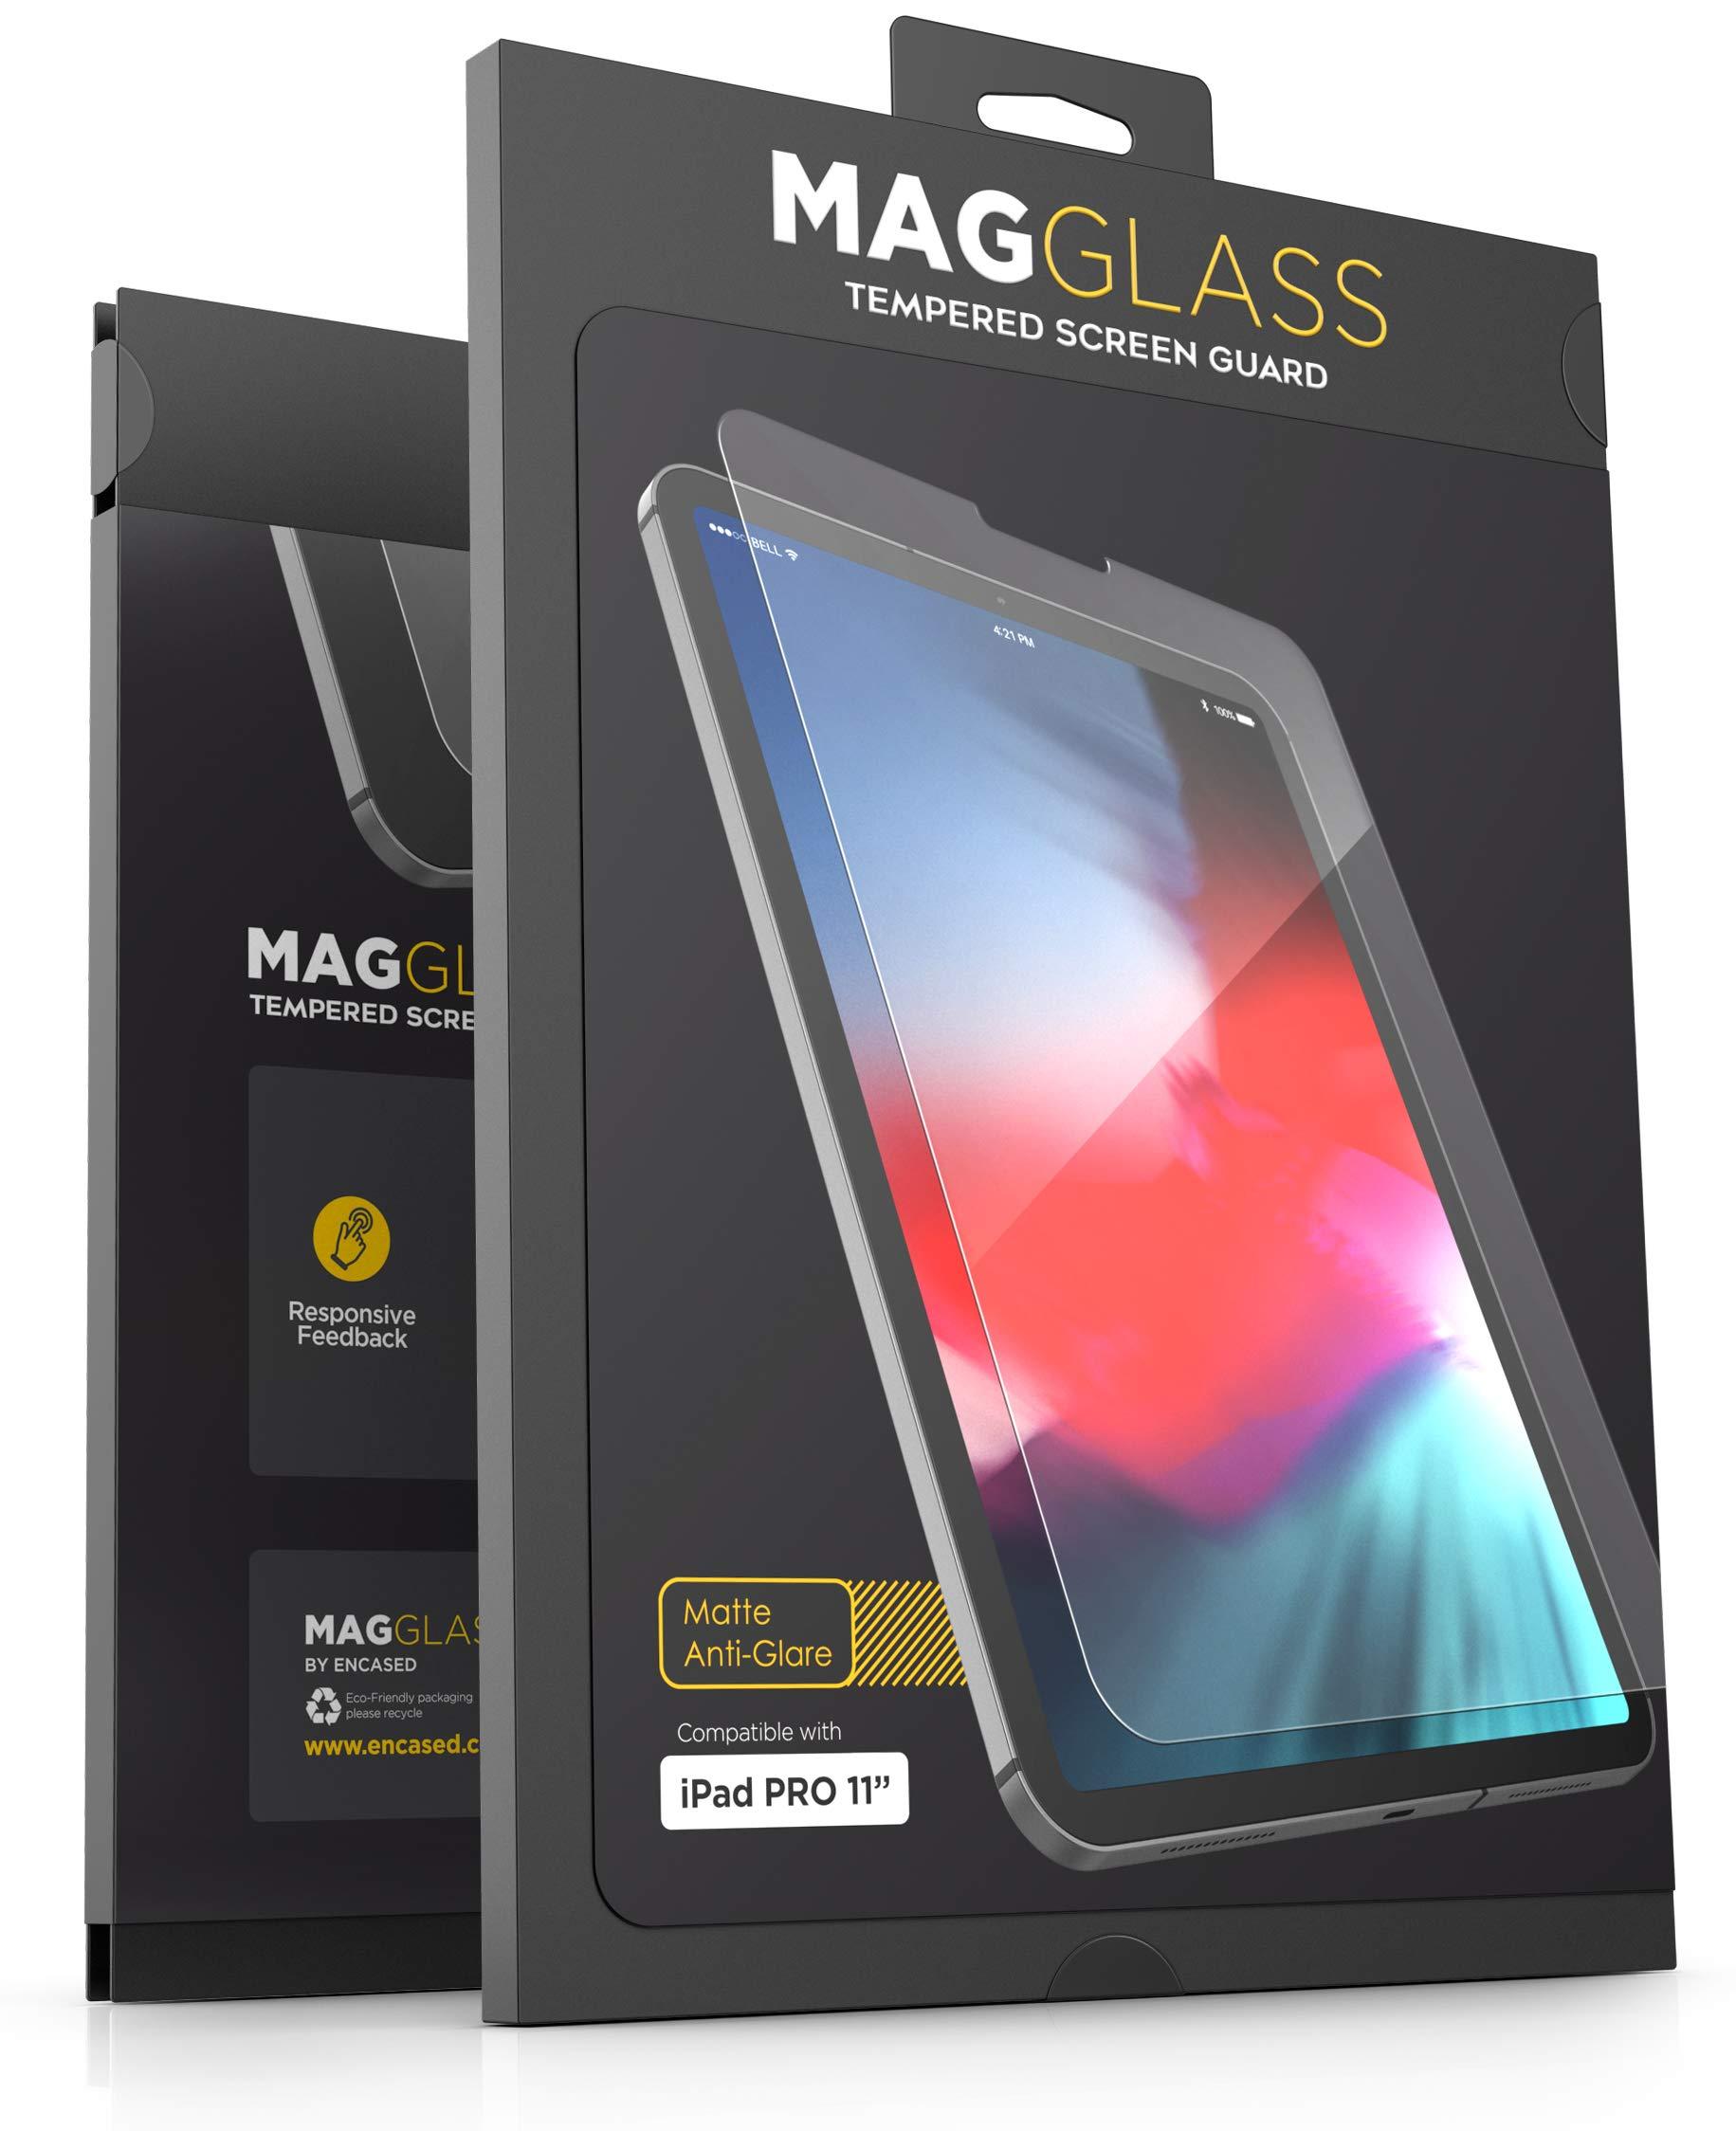 MagGlass iPad Pro 11'' Tempered Glass Matte Screen Protector - Fingerprint Resistant Anti Glare Screen Guard (Case Compatible)